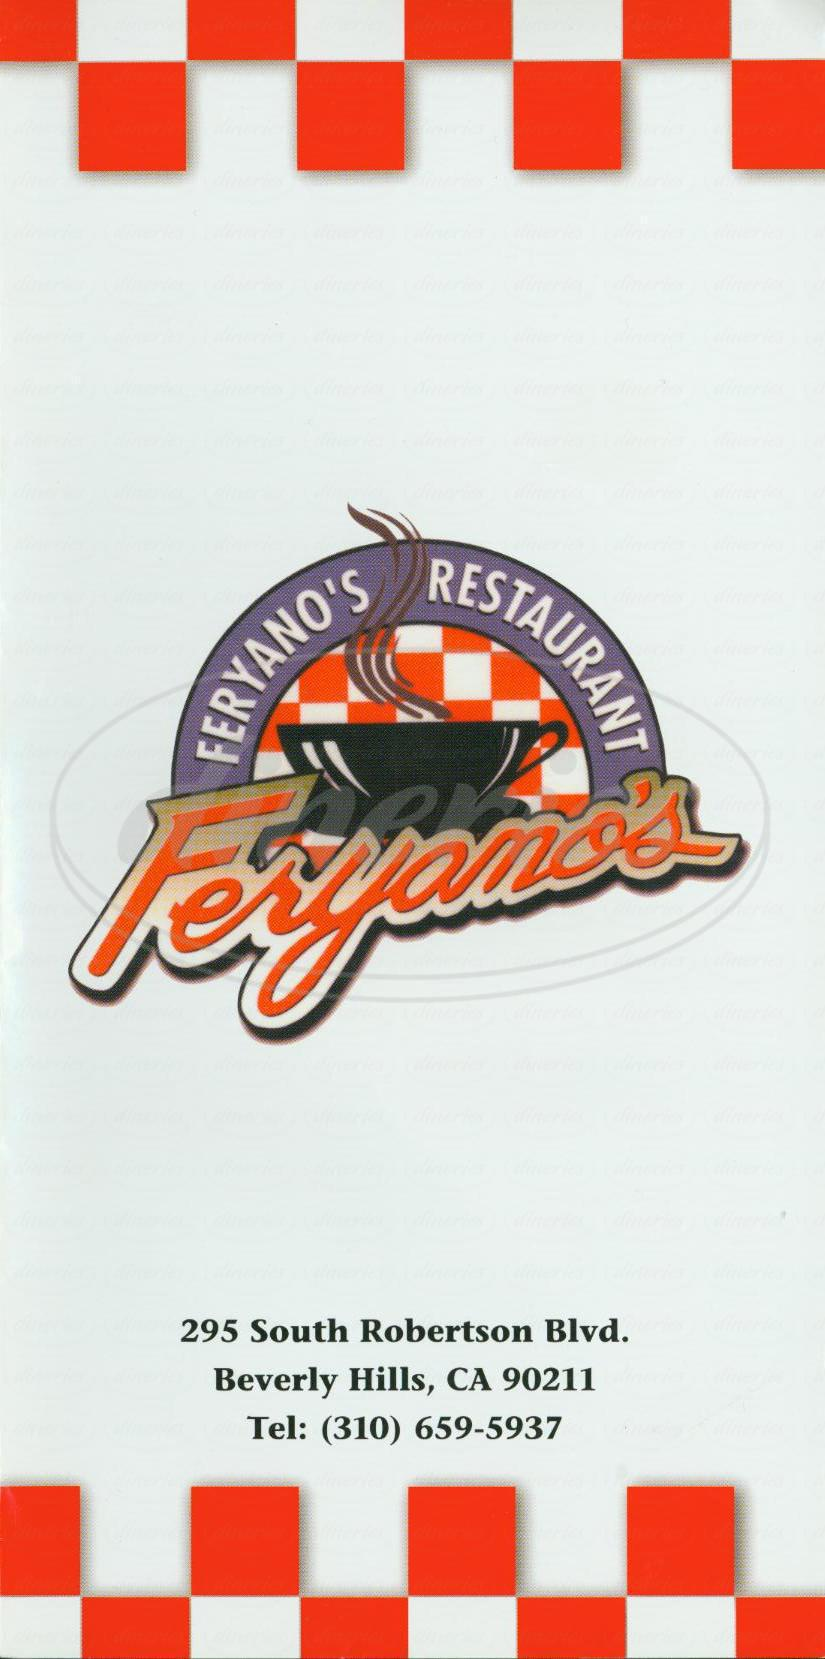 menu for Feryano's Restaurant